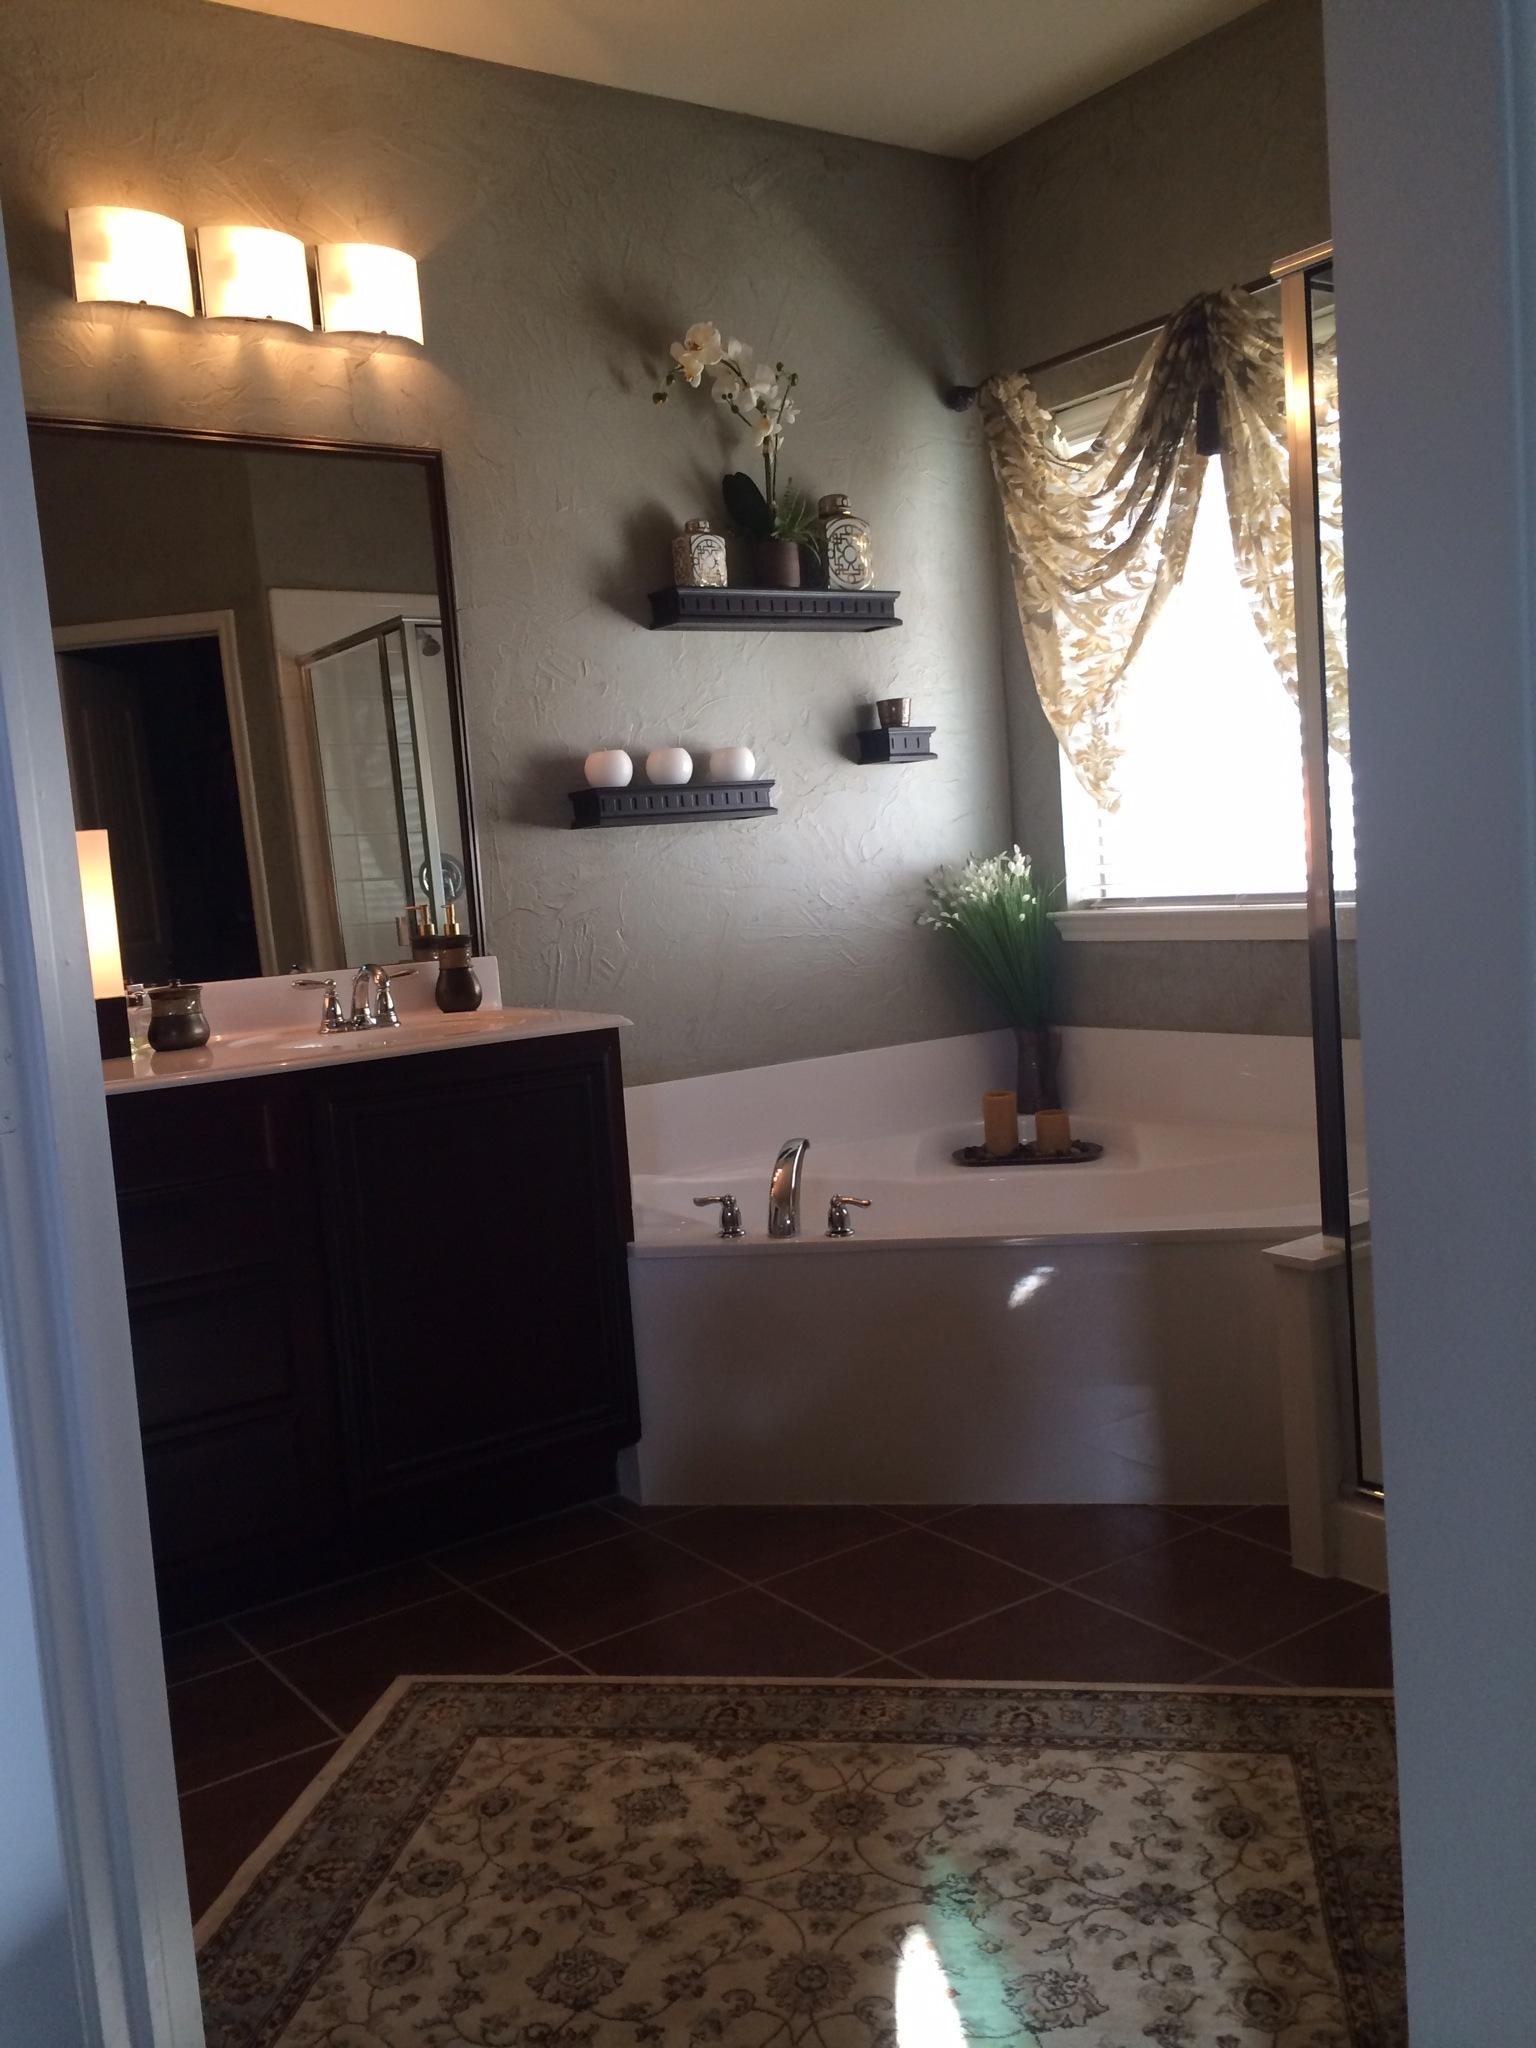 Bathroom Decor Project